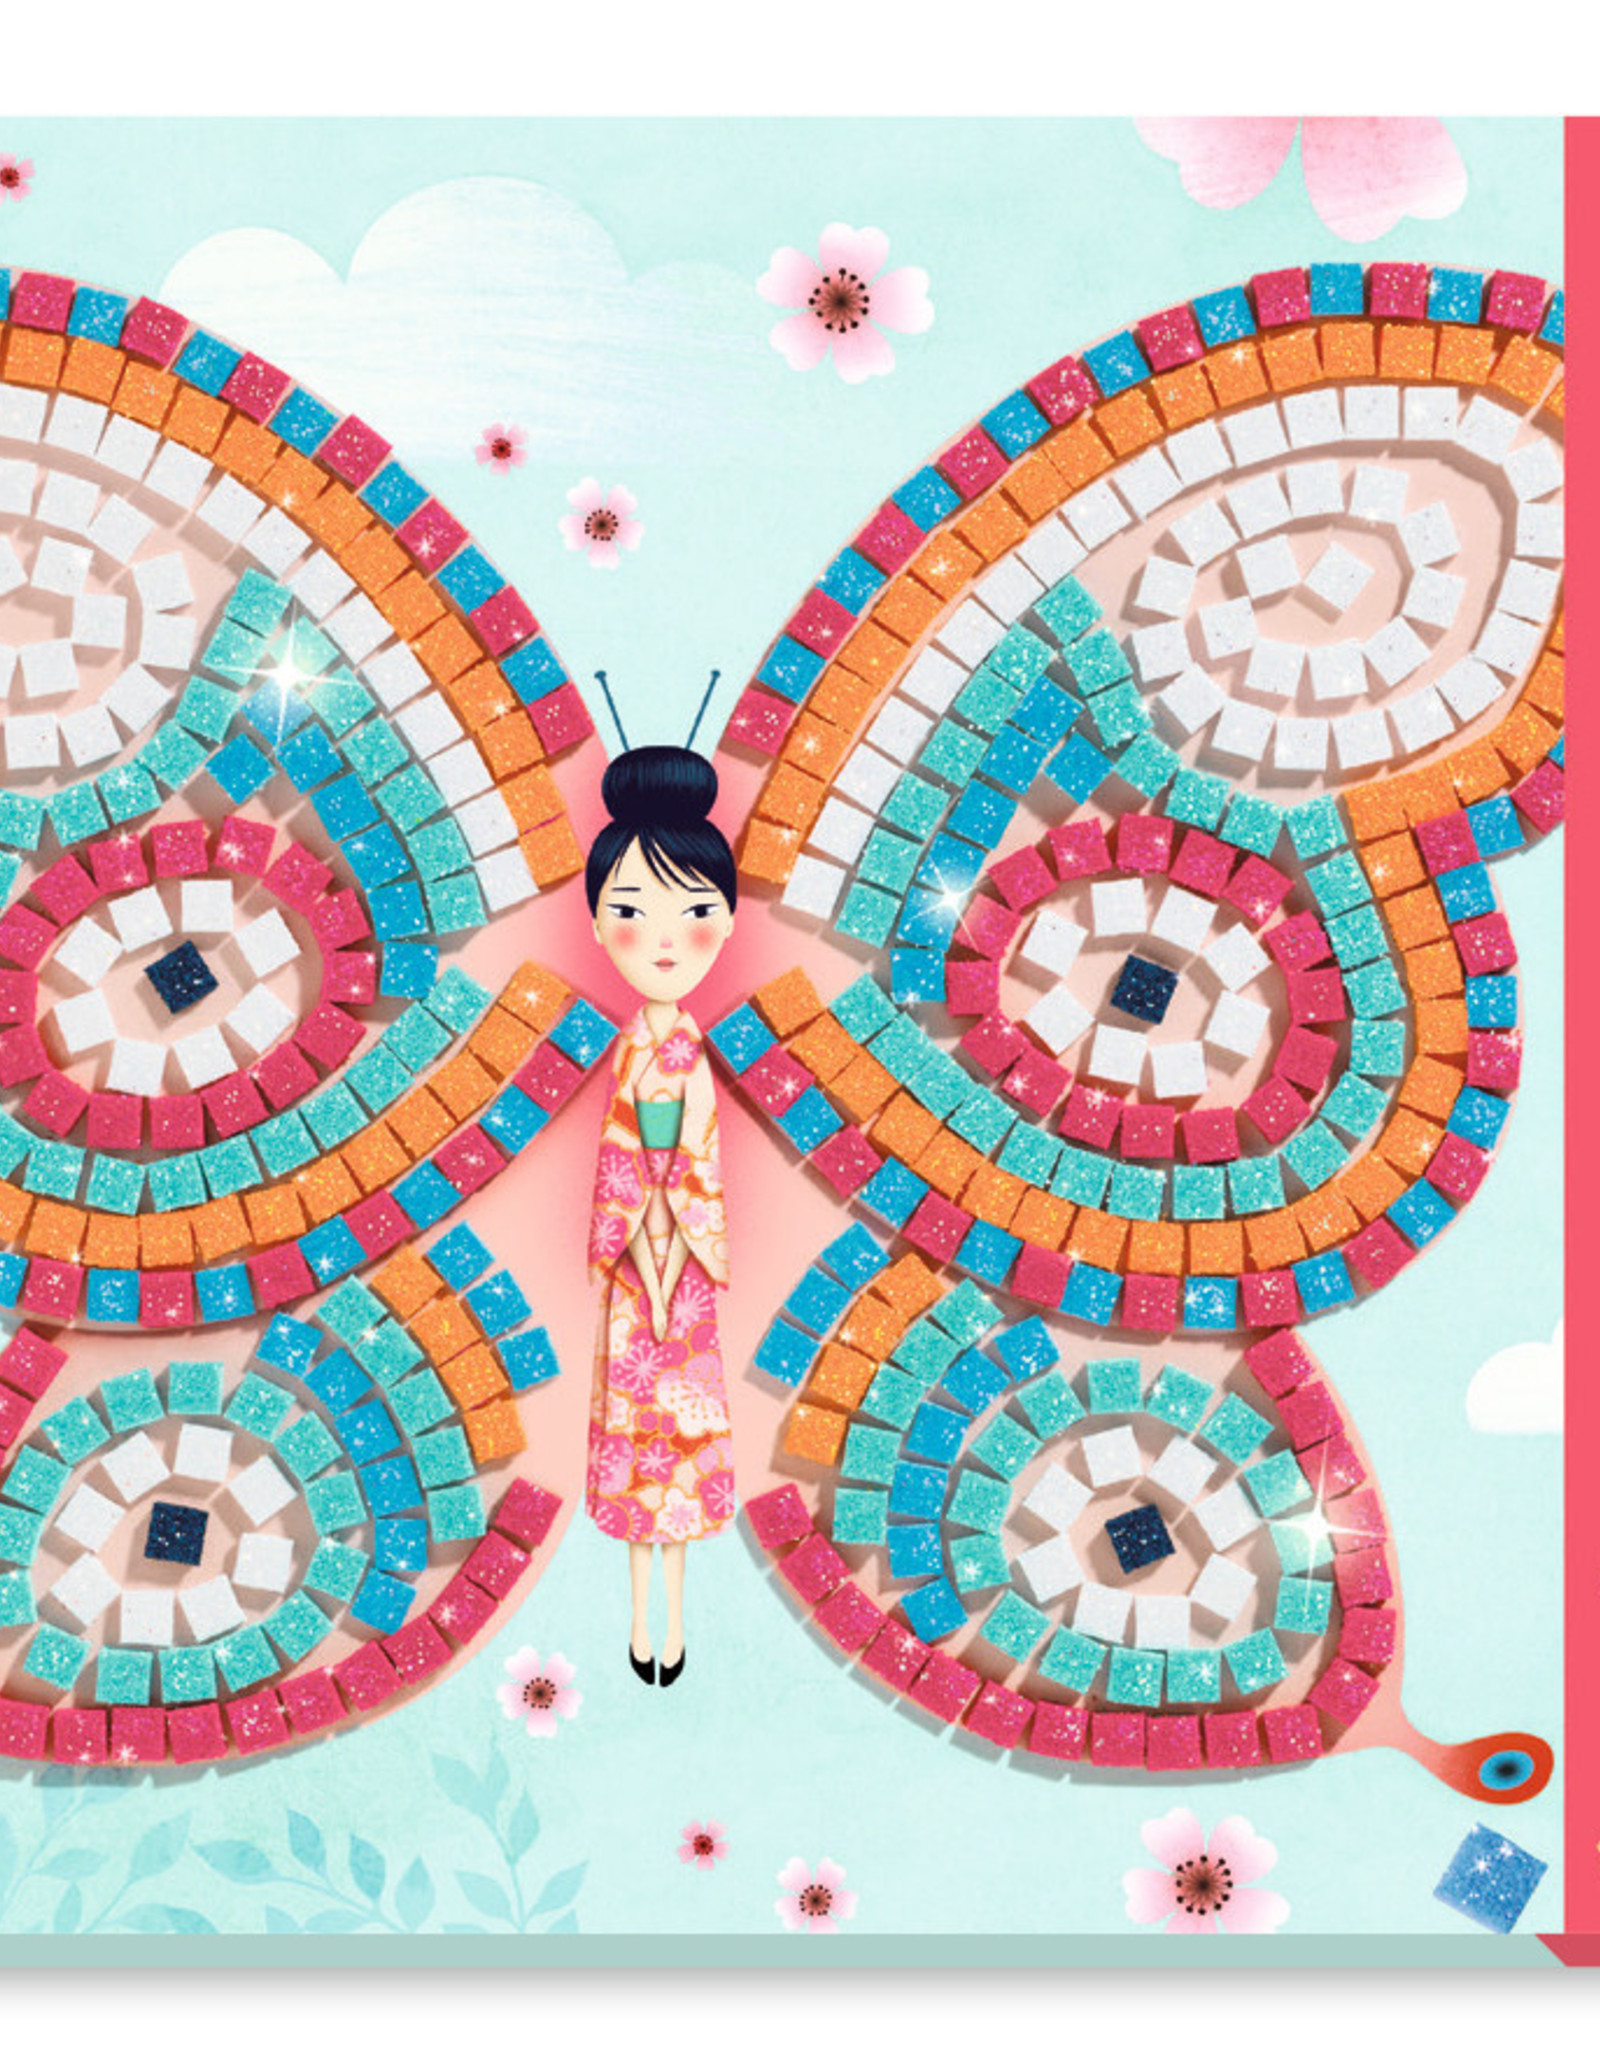 Djeco Butterflies Mosaic Kit